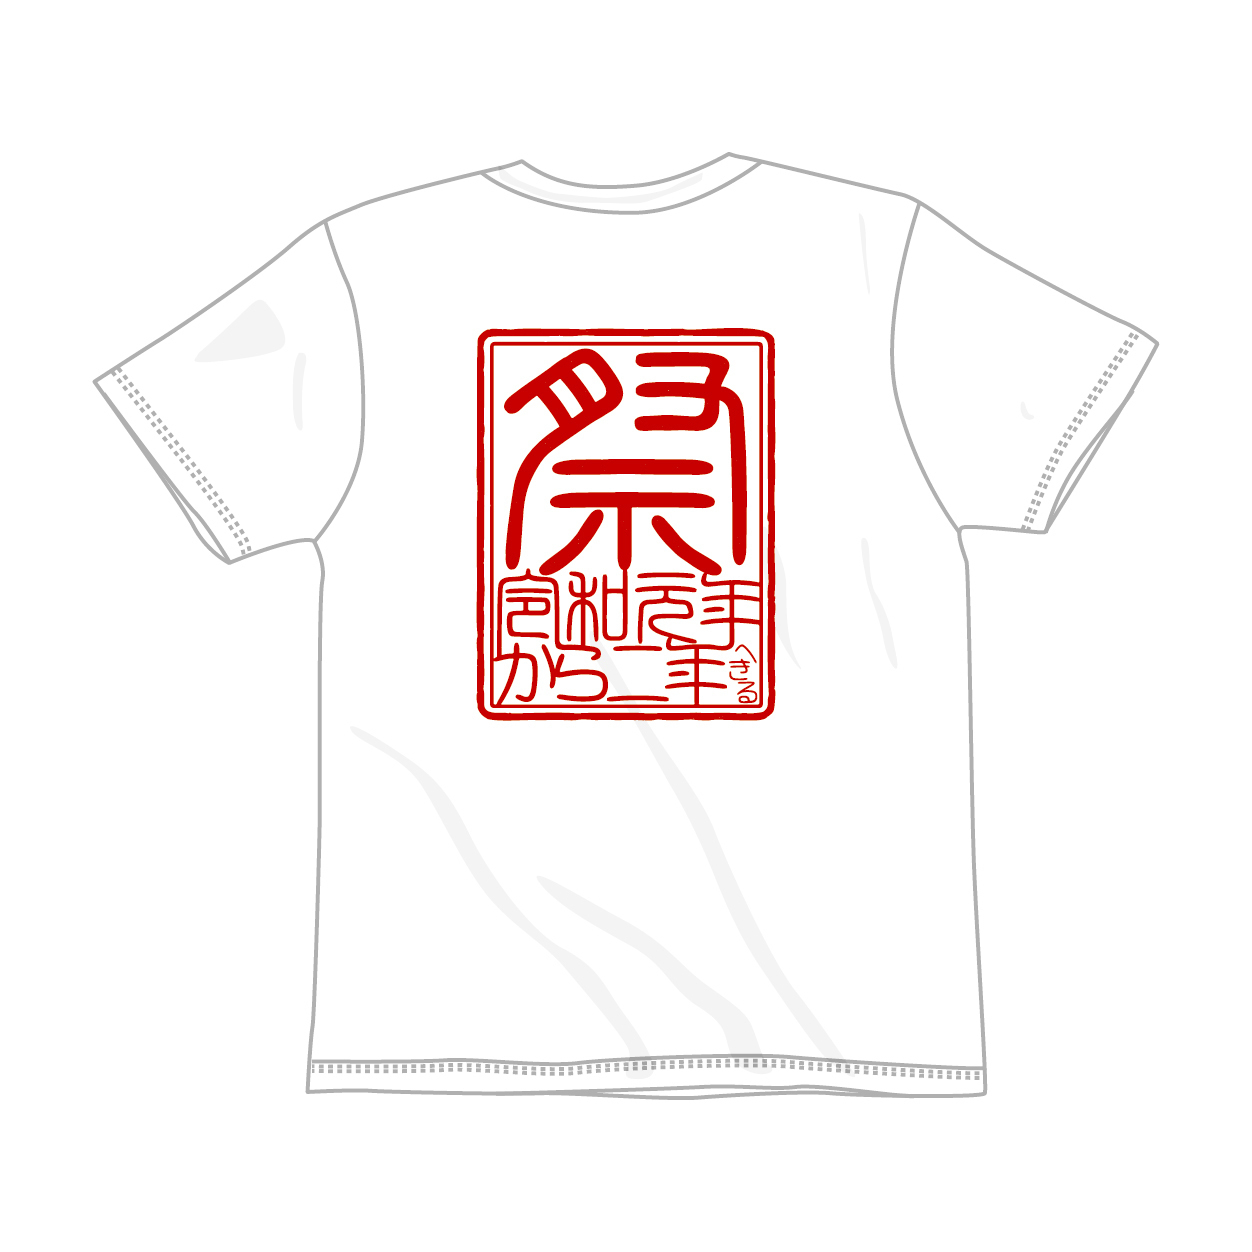 HEKIRU SHIINA 2019-2020 カウントダウンTシャツ【ホワイト】